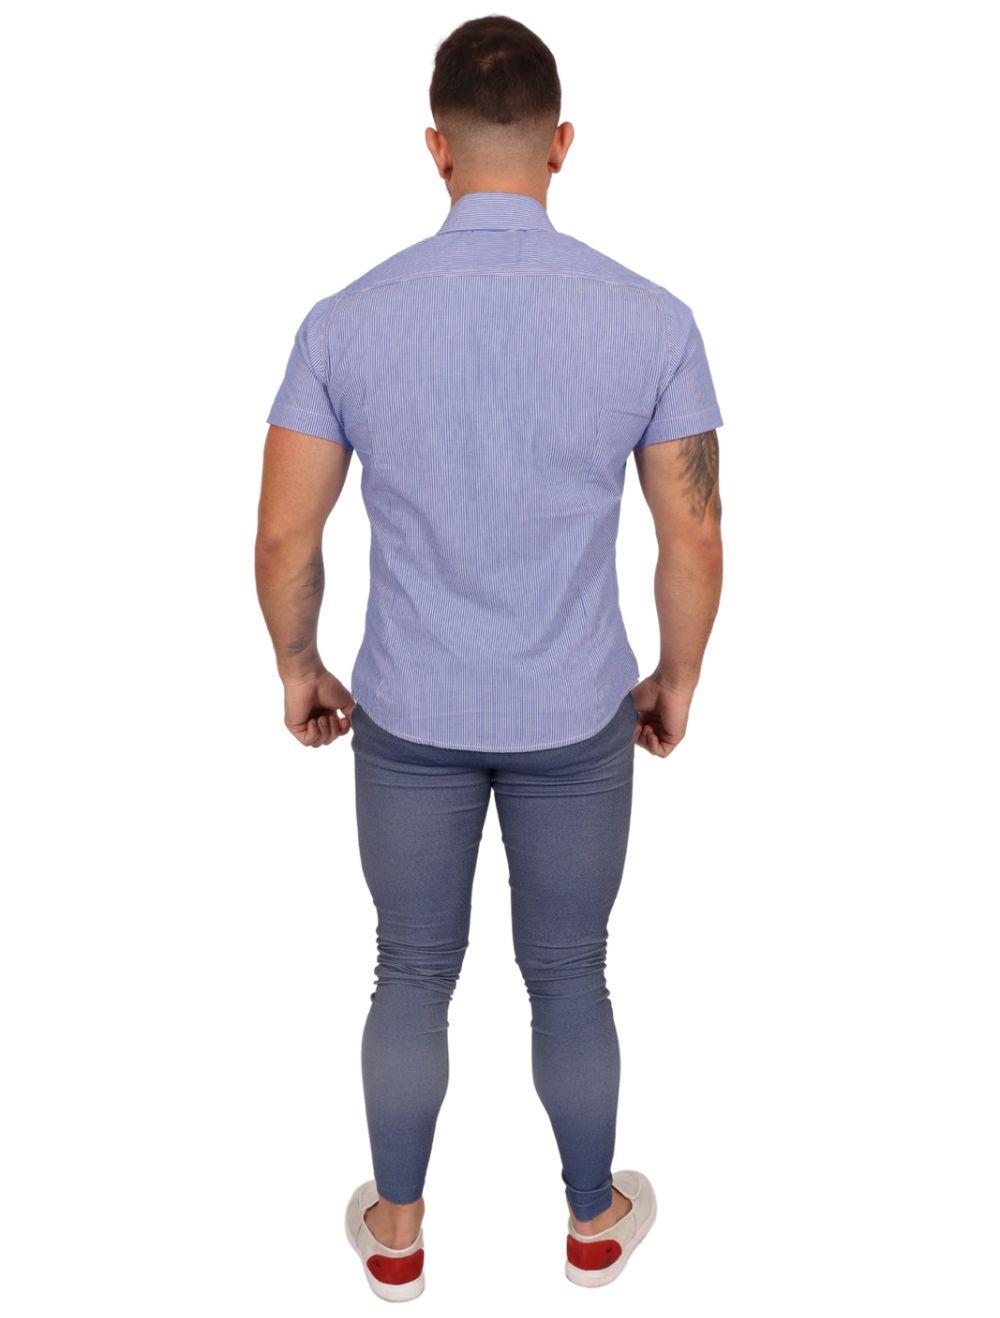 Camisa Masculina Manga Curta Azul com Listras